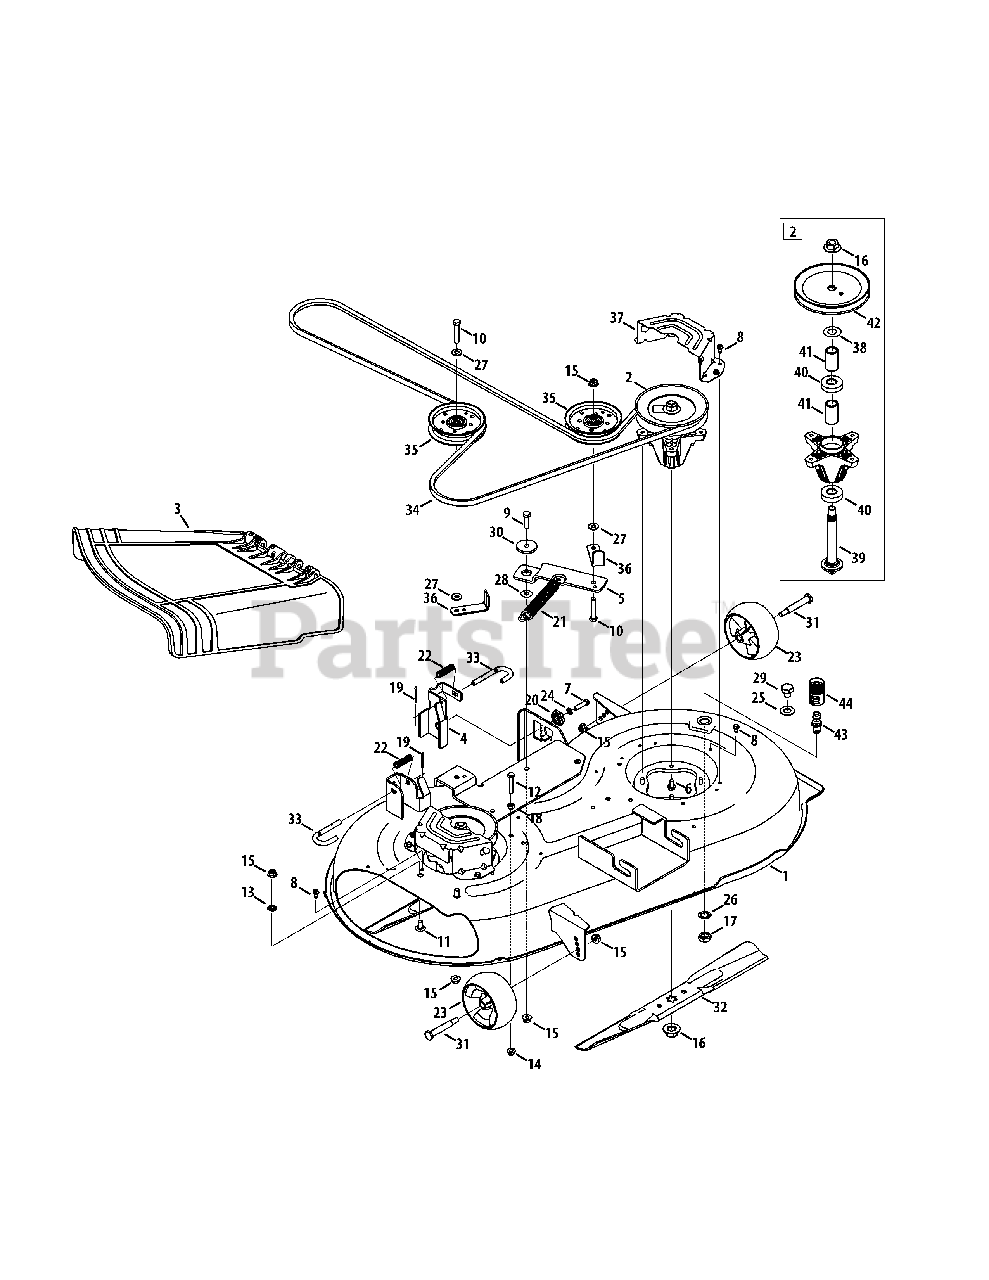 Mtd Mower Deck Diagram 42 Inch : mower, diagram, 17AF2ACS004, Zero-Turn, Mower, (2011), 42-Inch, Parts, Lookup, Diagrams, PartsTree